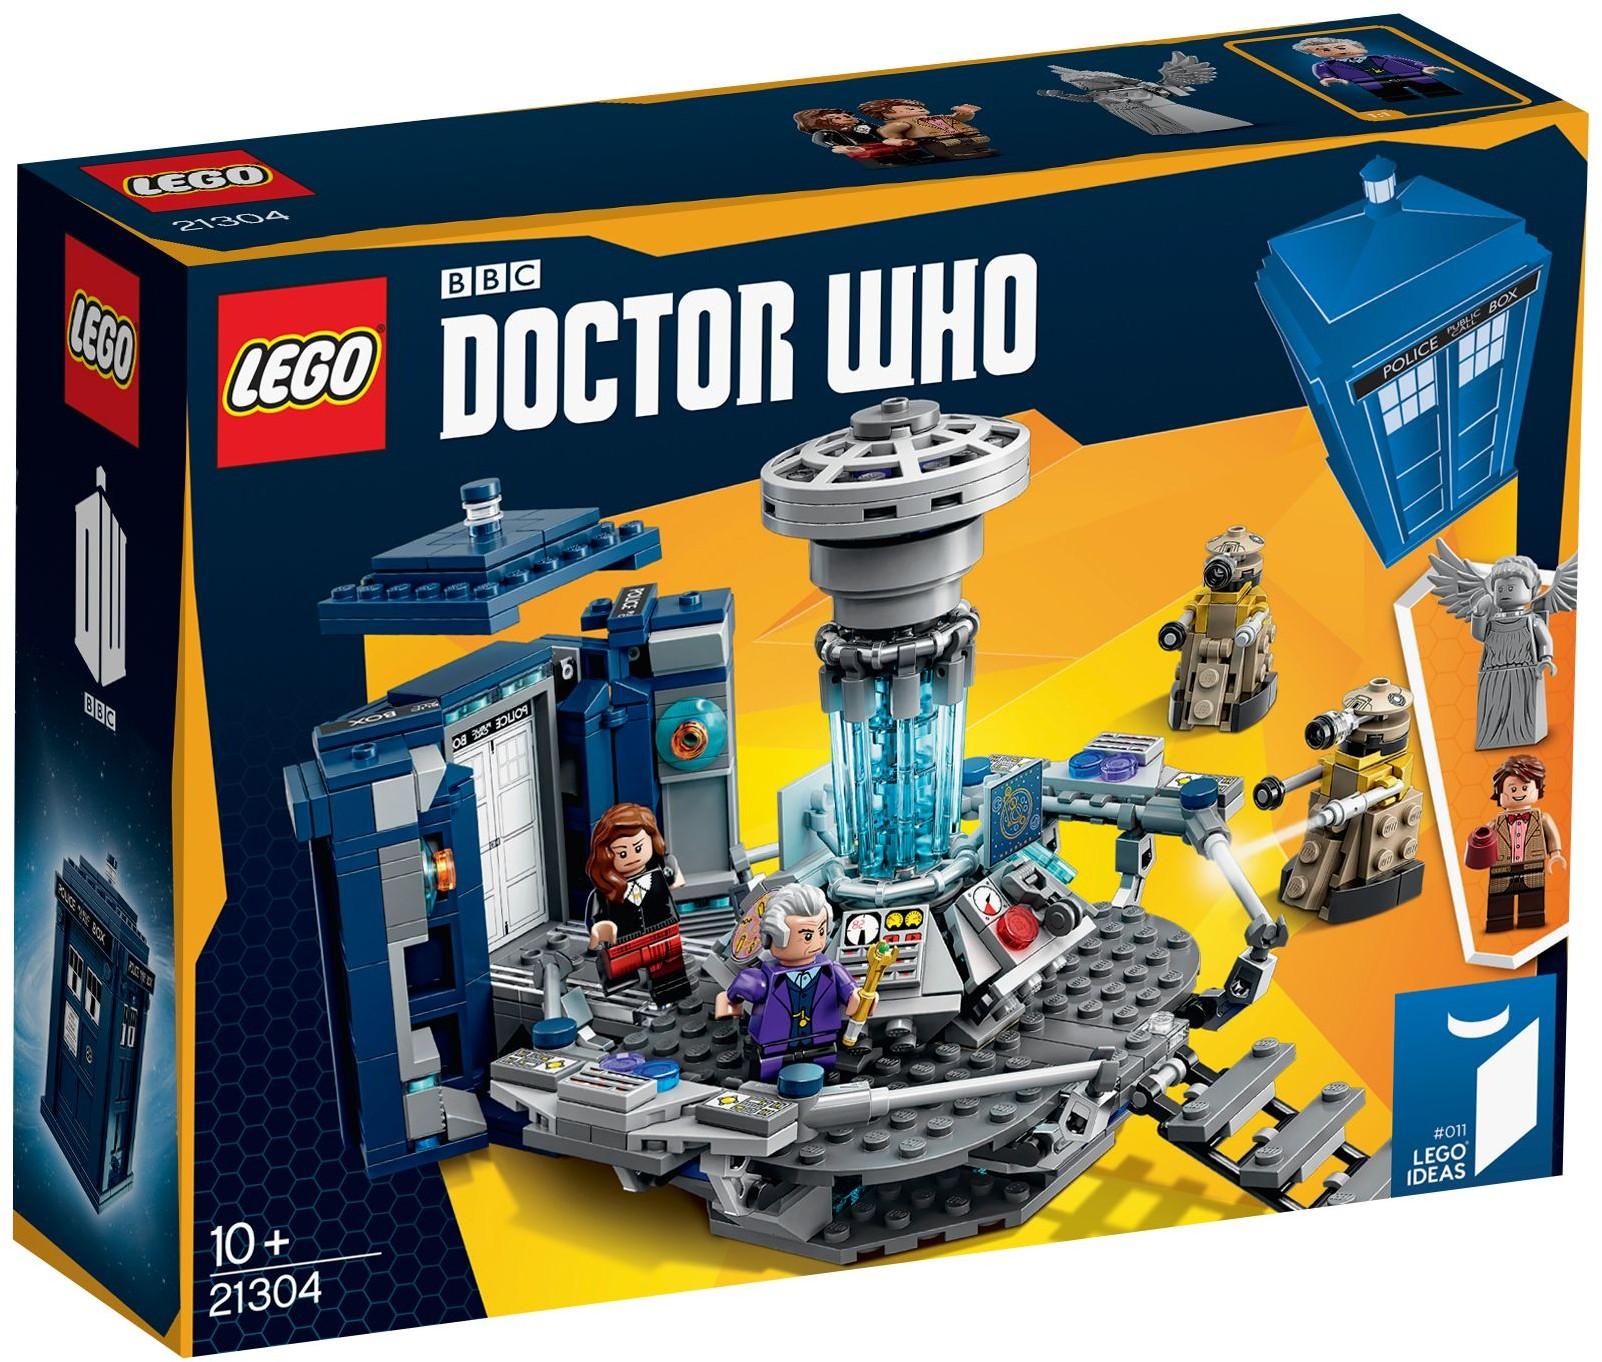 LEGO 21304 - CUUSO / Ideas - Doctor Who